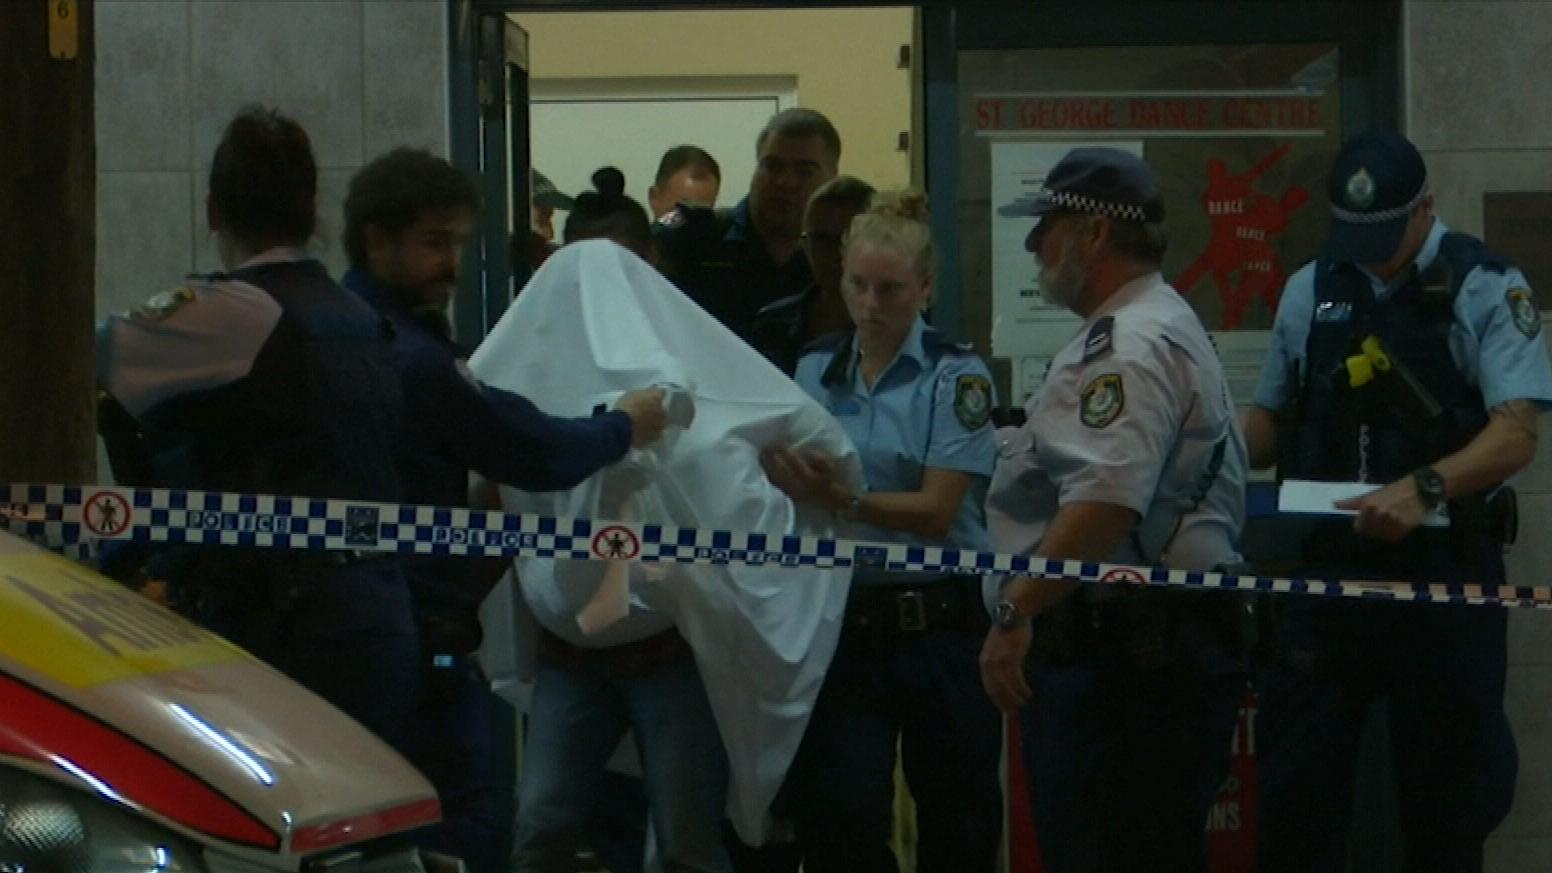 Police investigate 'threatening phone calls' before Kogarah 'sex assault'